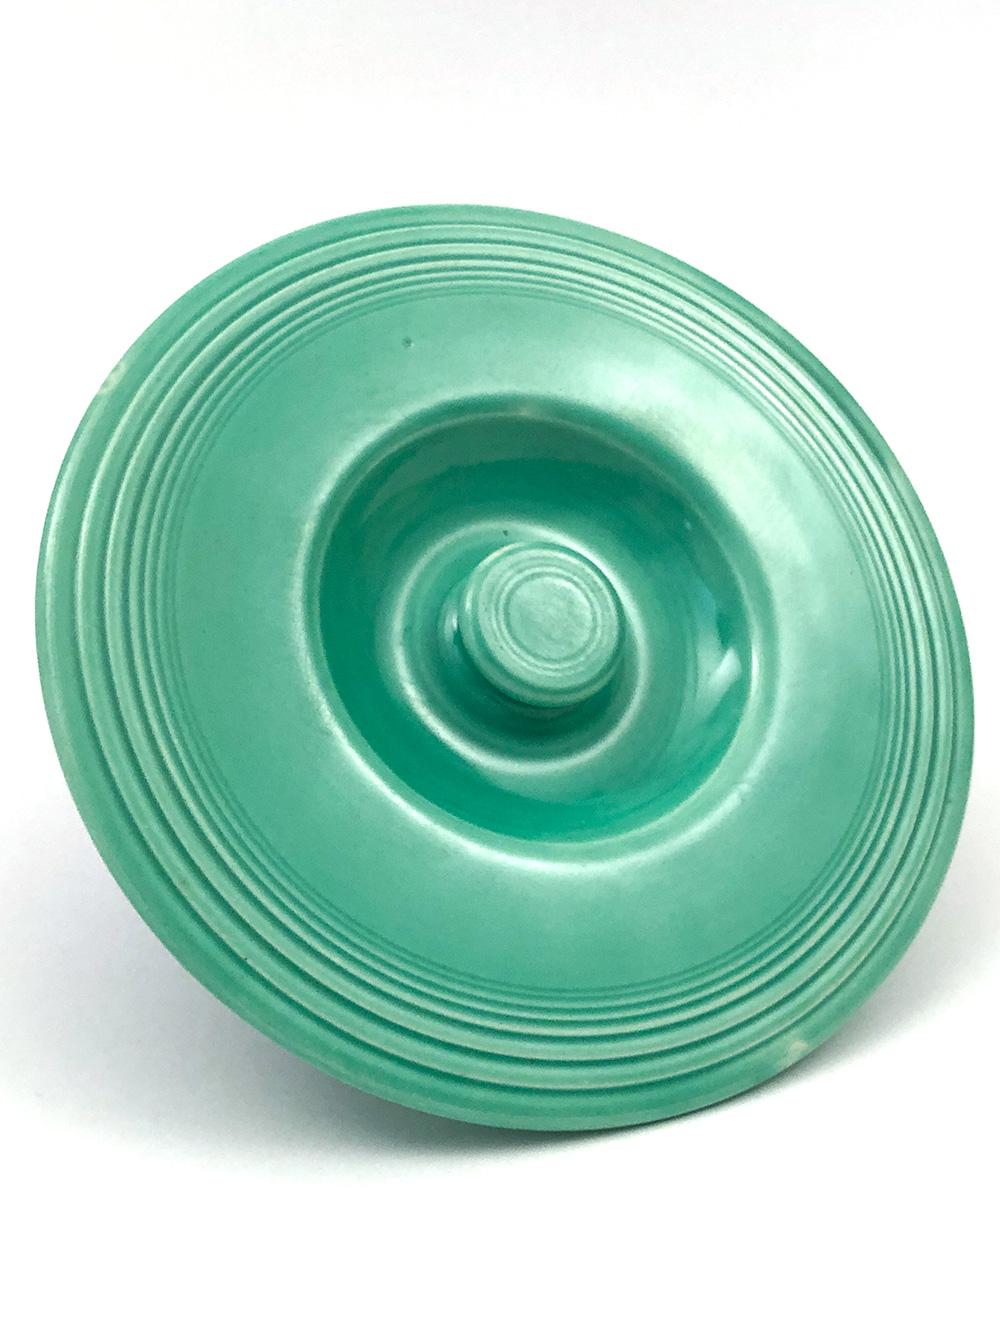 vintage fiesta green mixing bowl lid